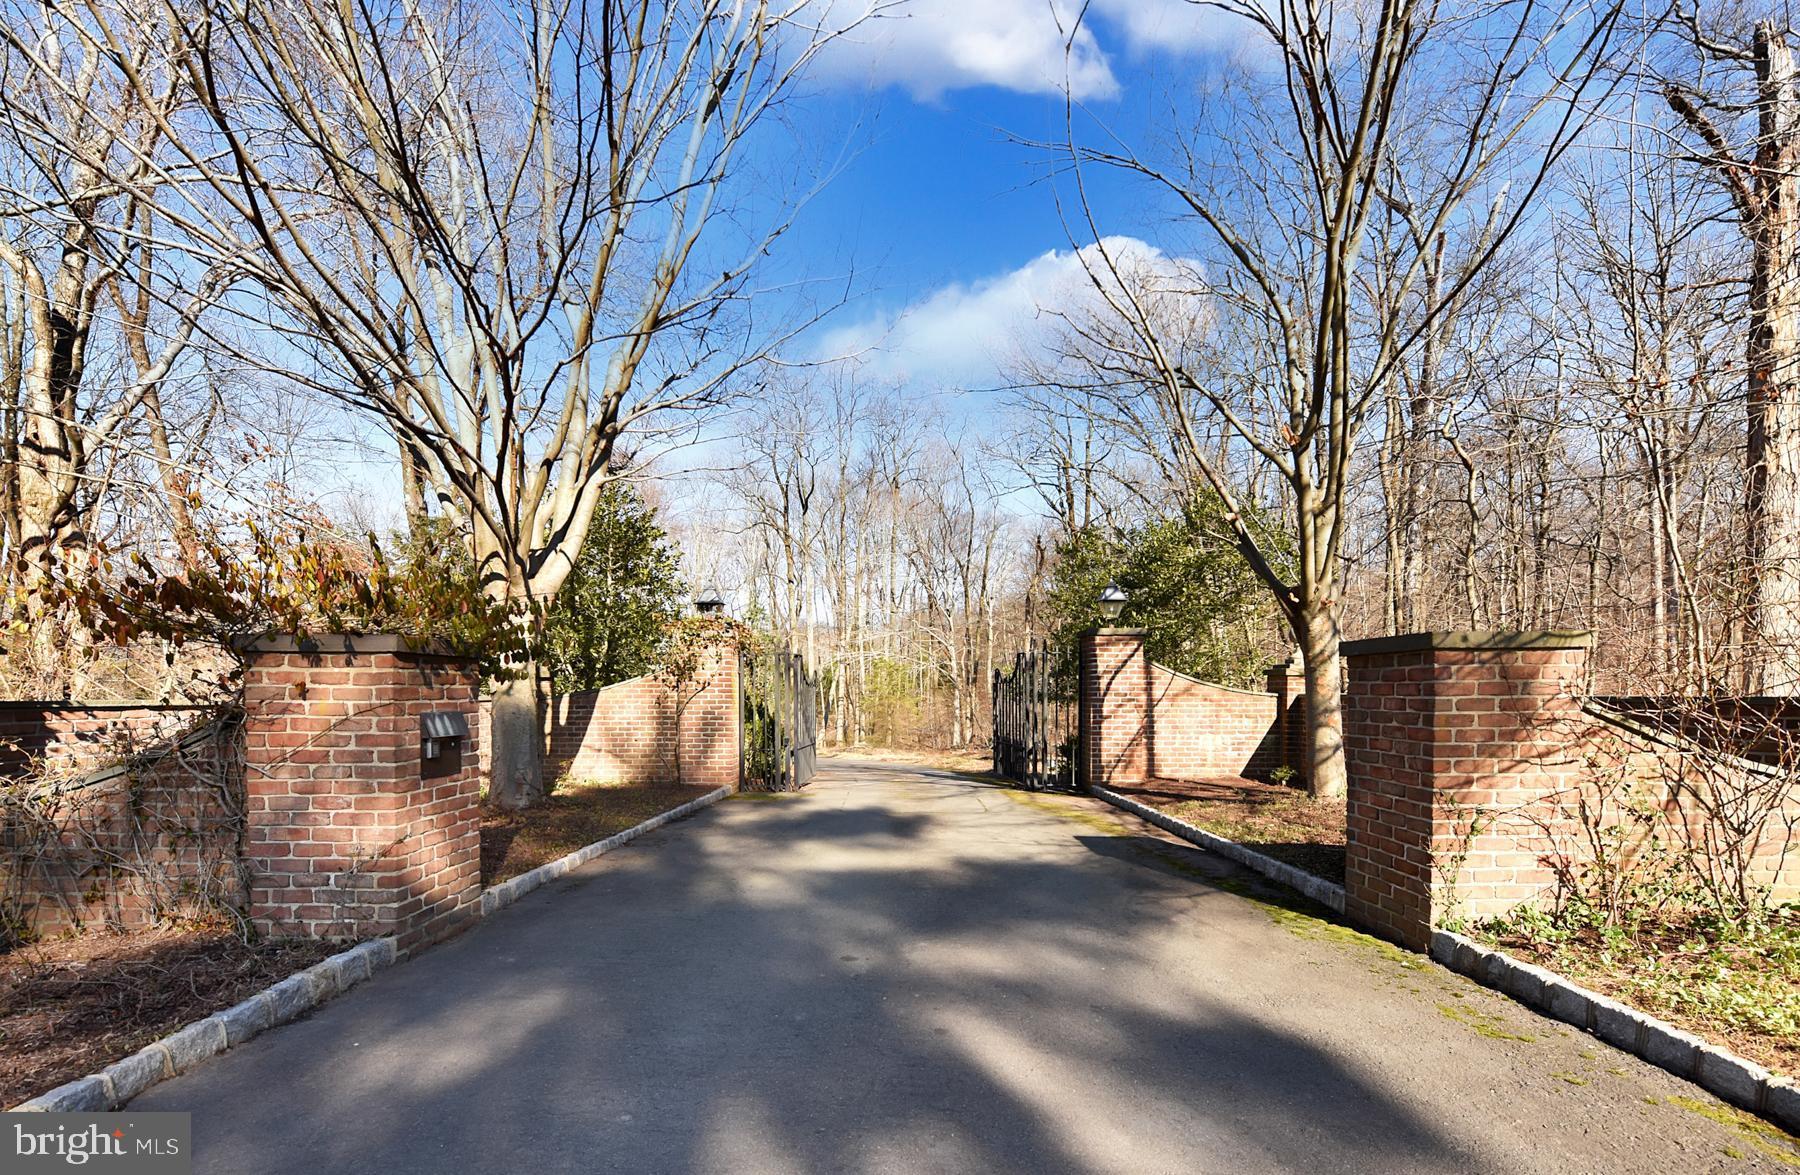 5279 Province Line Rd, Princeton, NJ, 08540